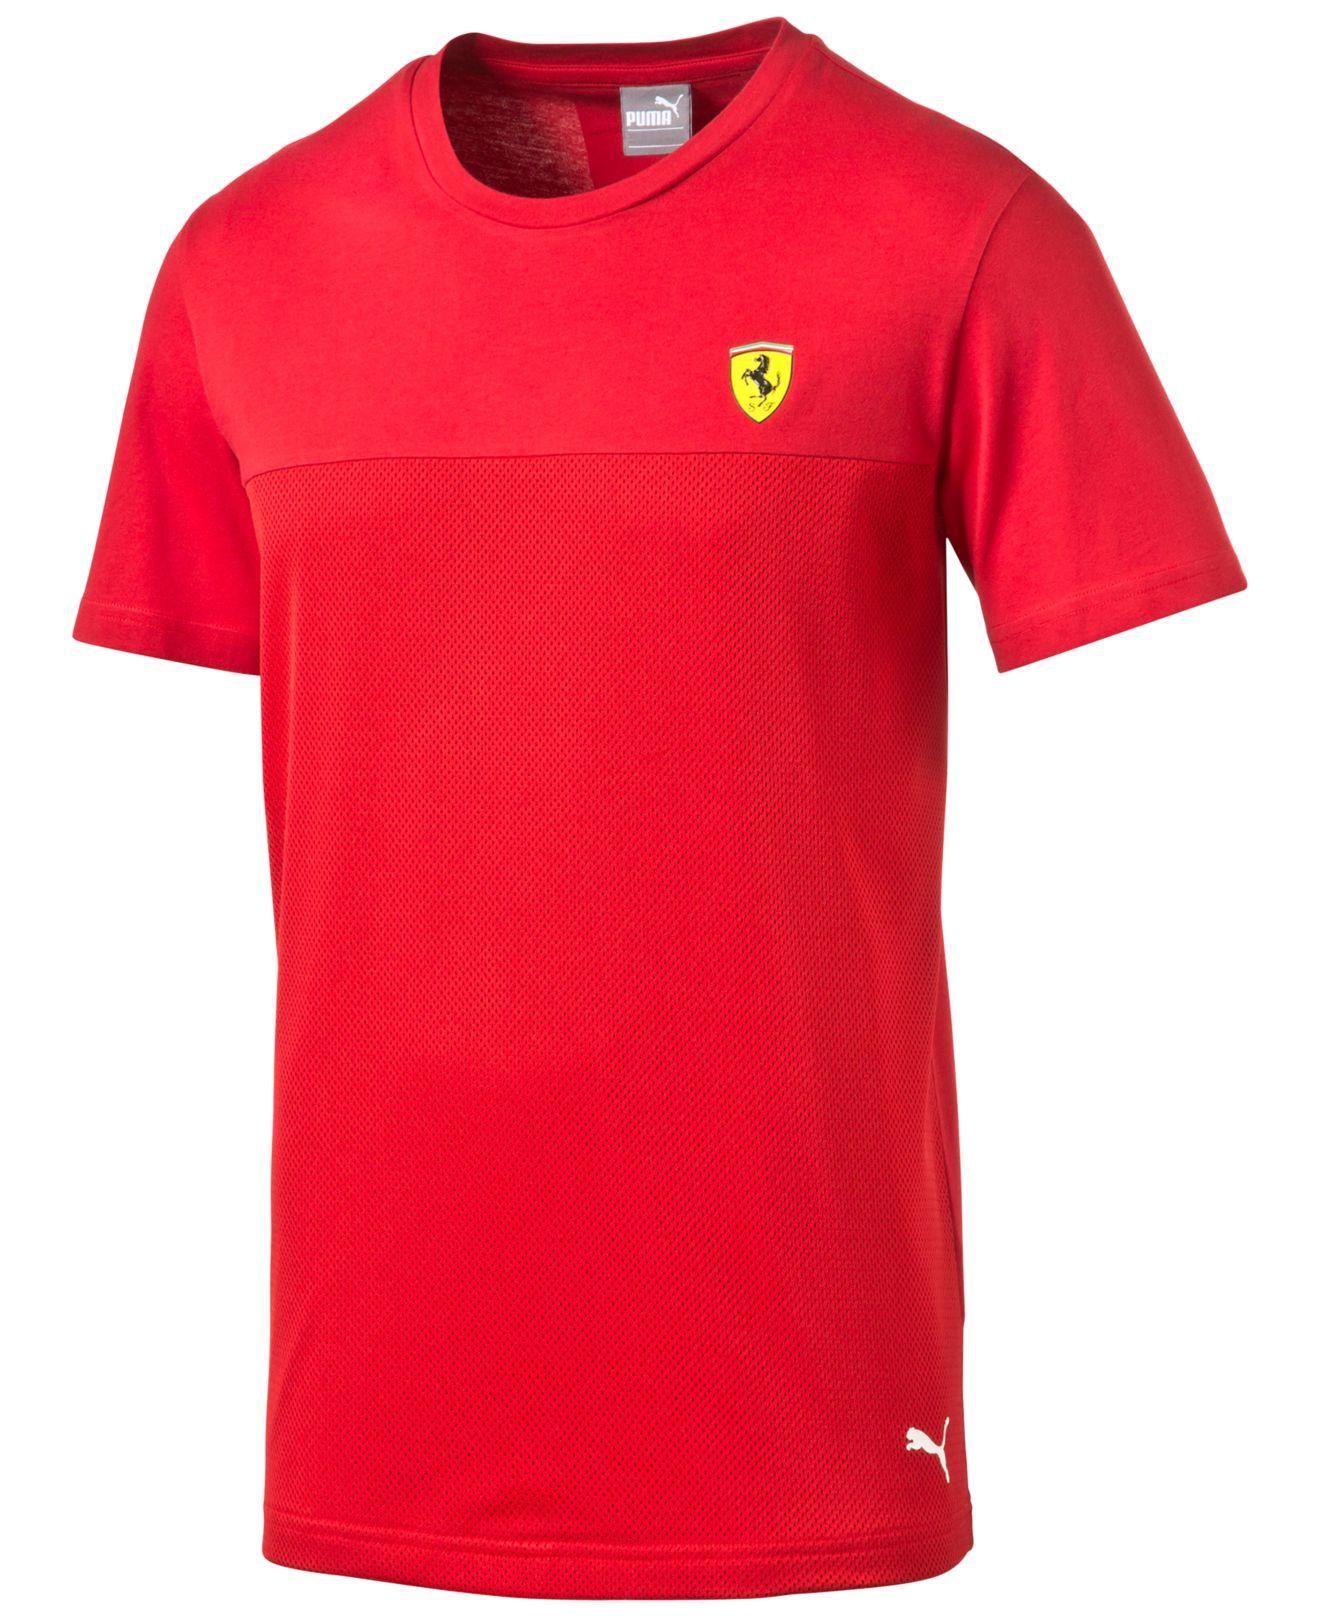 puma mens ferrari tshirt in red for men save 43 lyst